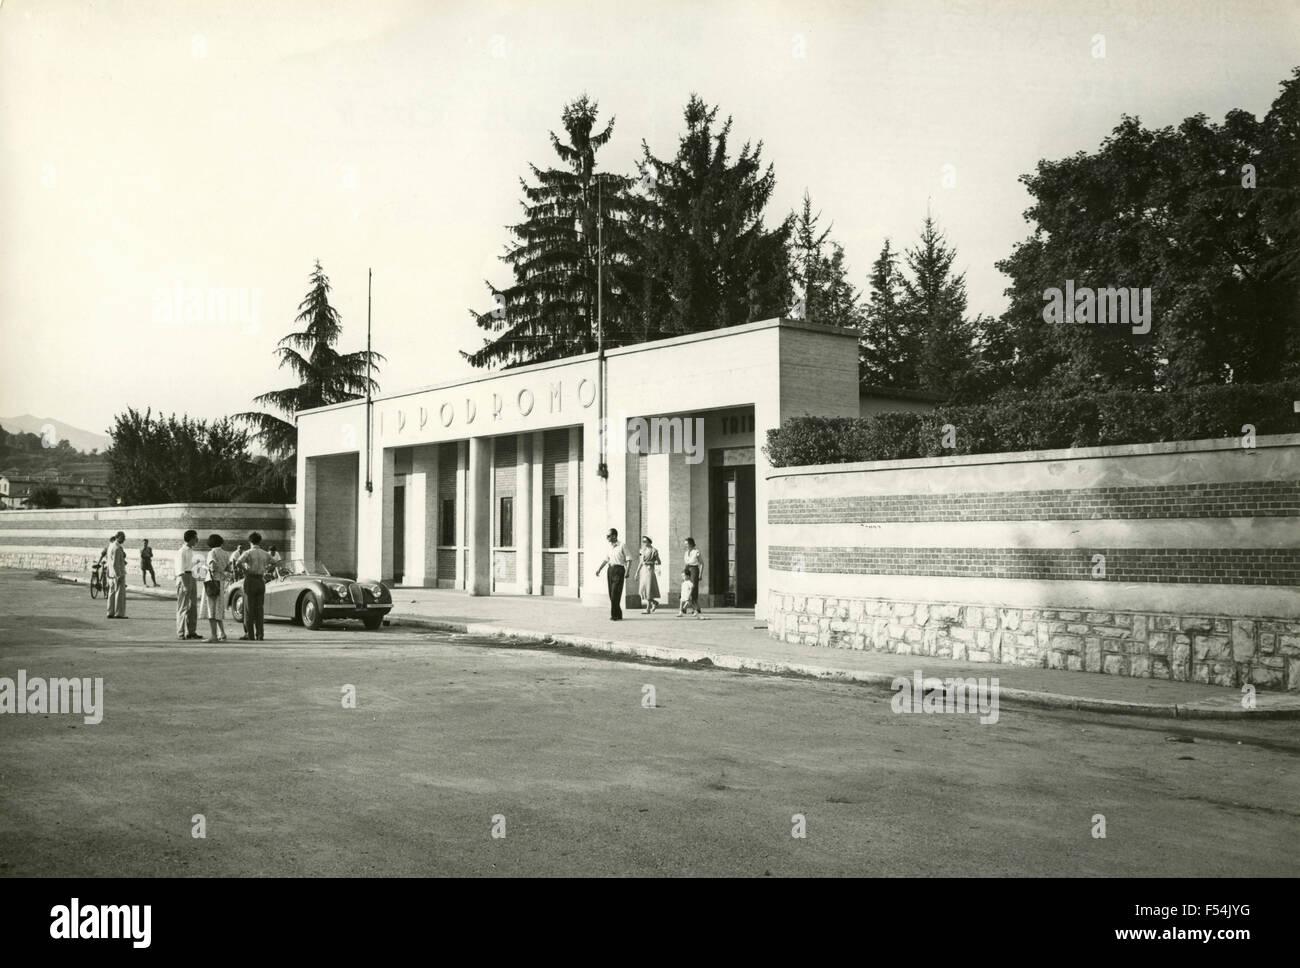 La entrada al hipódromo Bettole, Varese, Italia Imagen De Stock